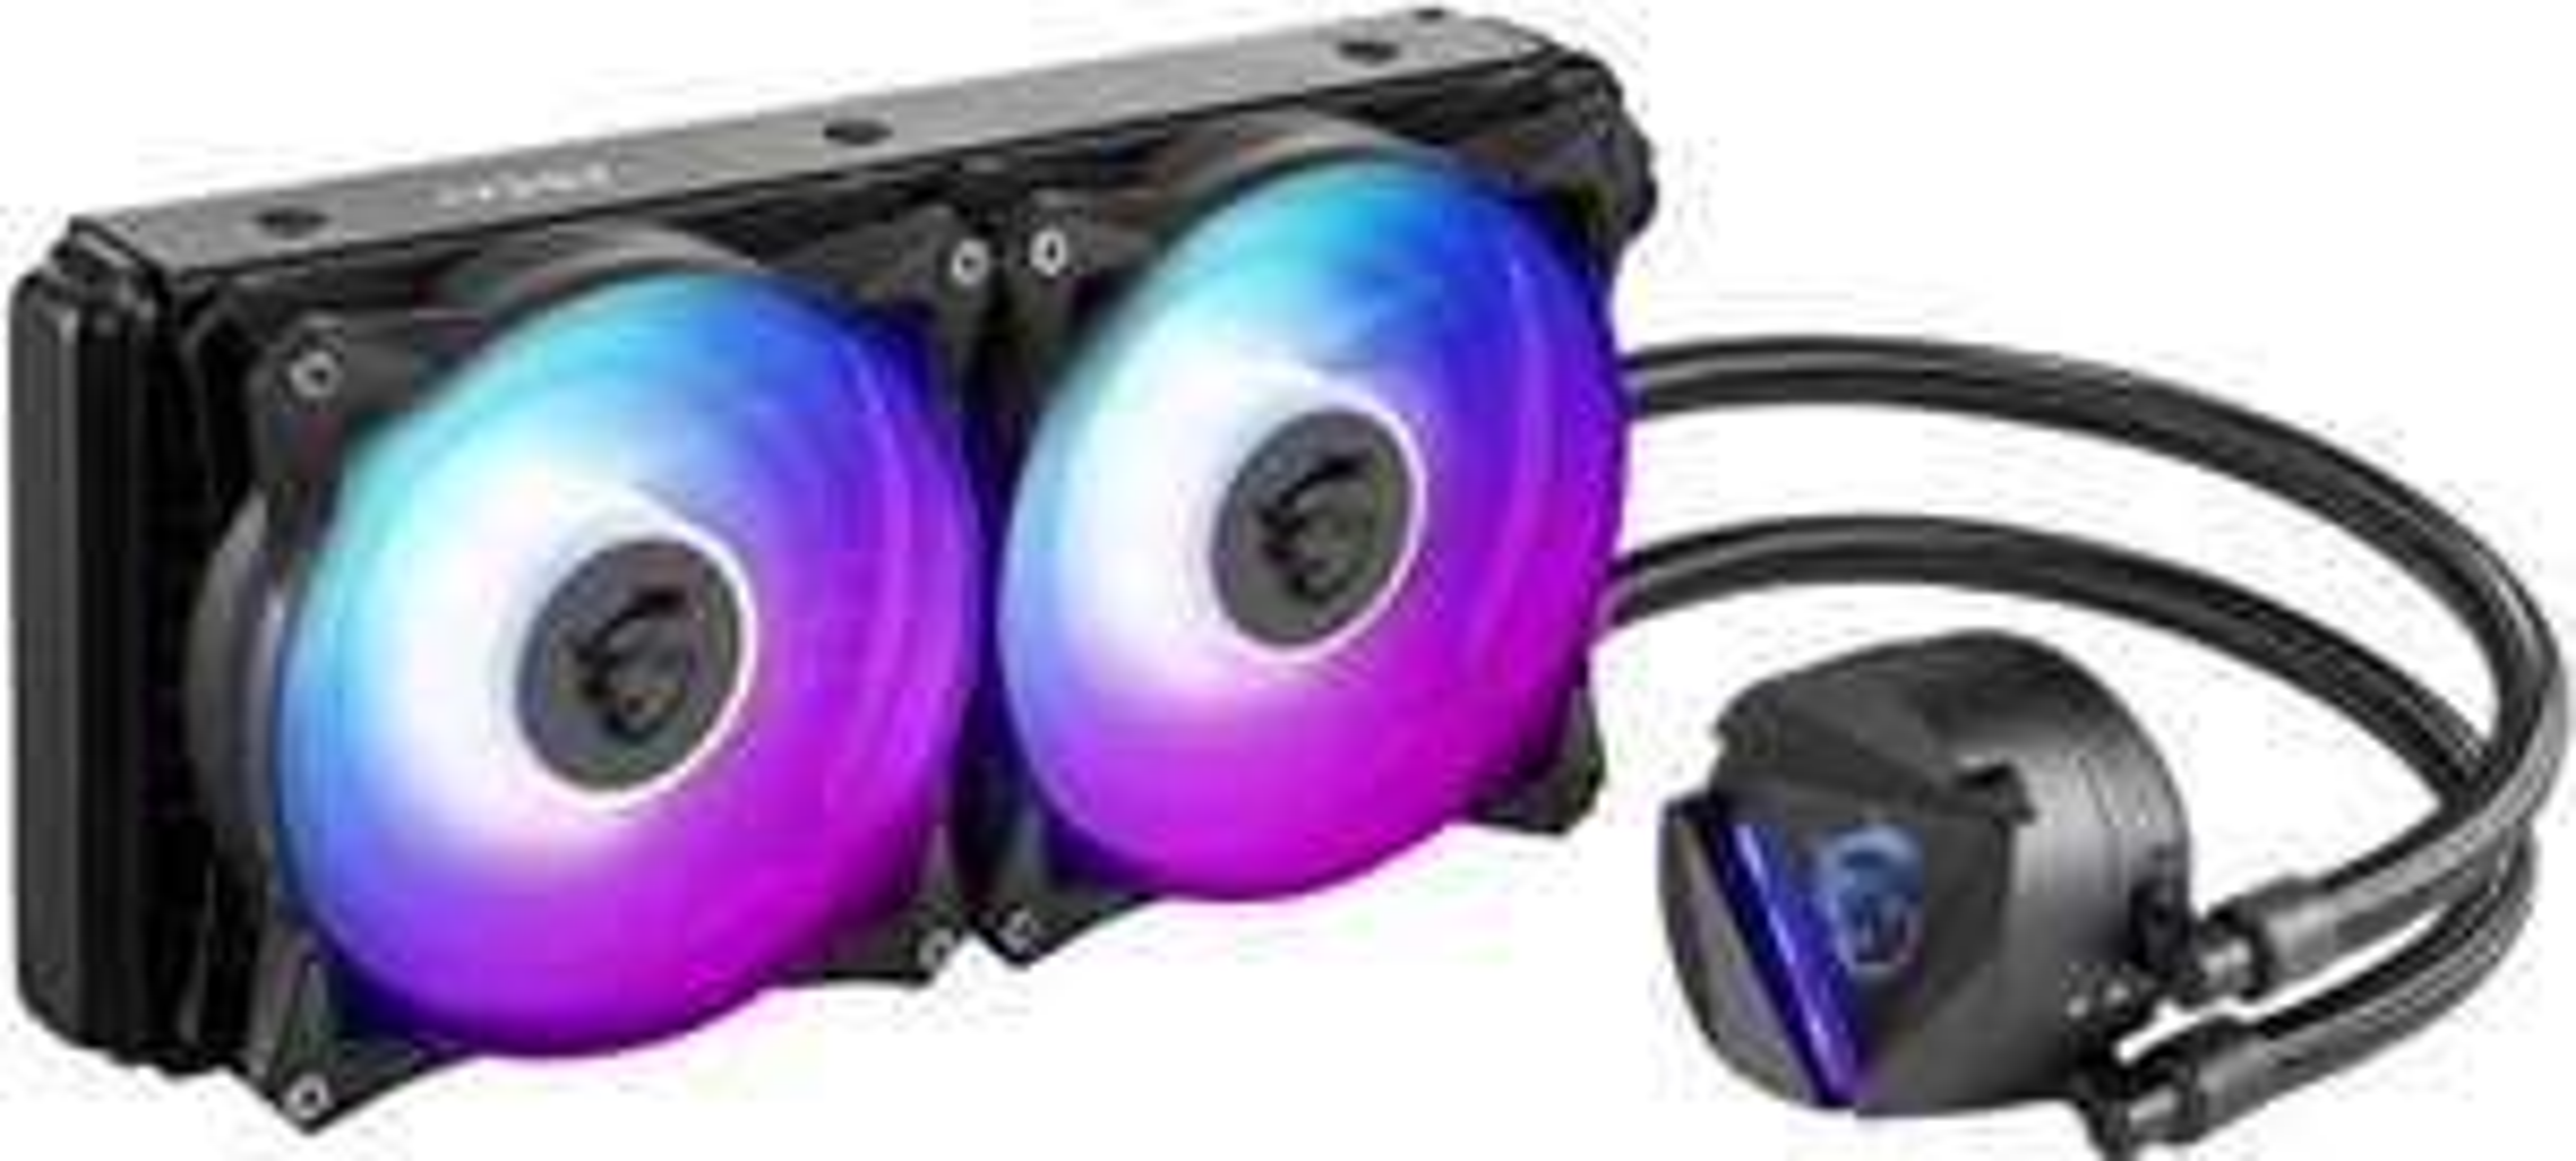 Kit Watercooling MSI Mag CoreLiquid 240R RGB (Via ODR de 10€)